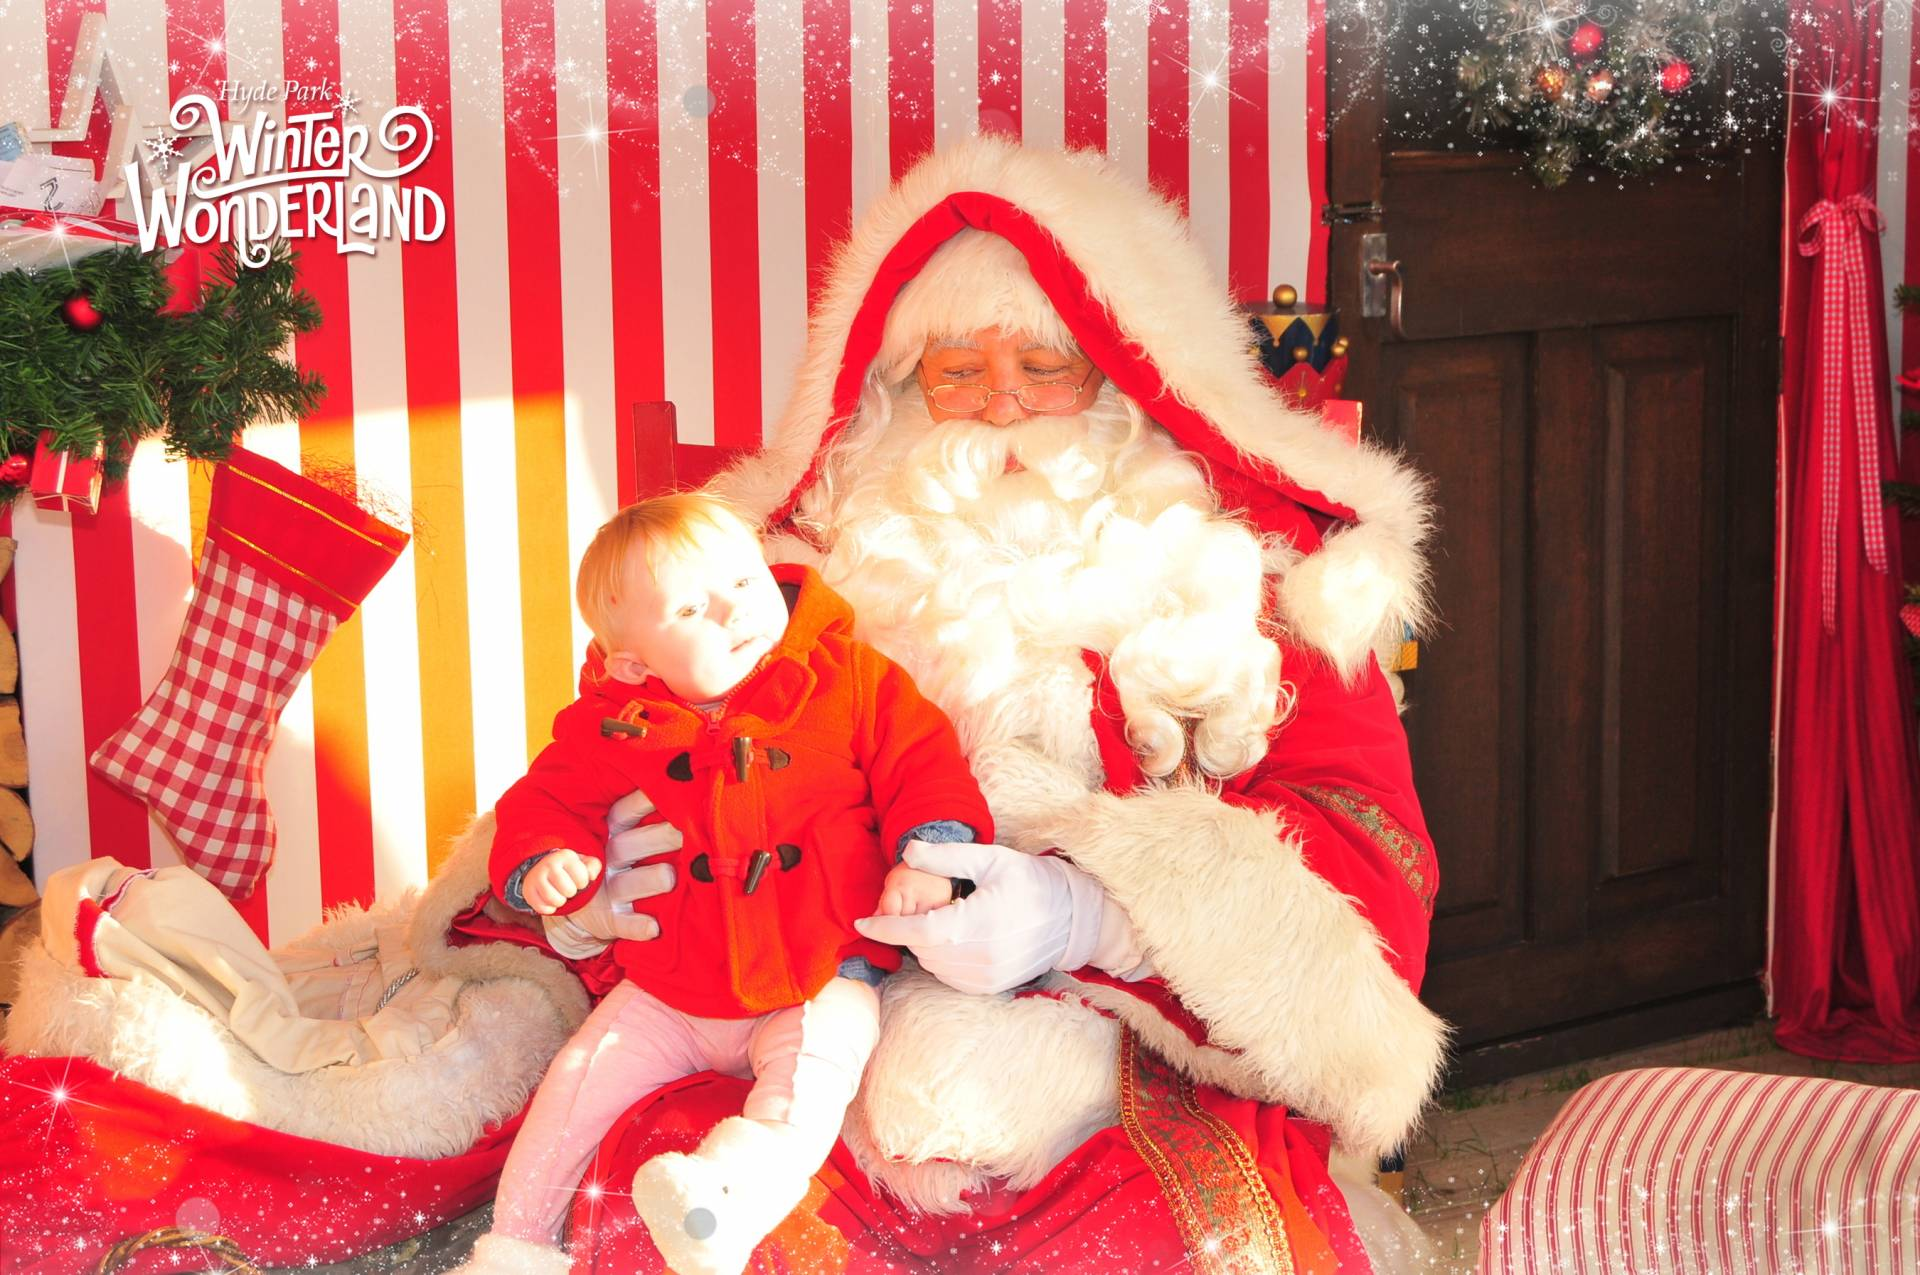 cece with santa at winter wonderland